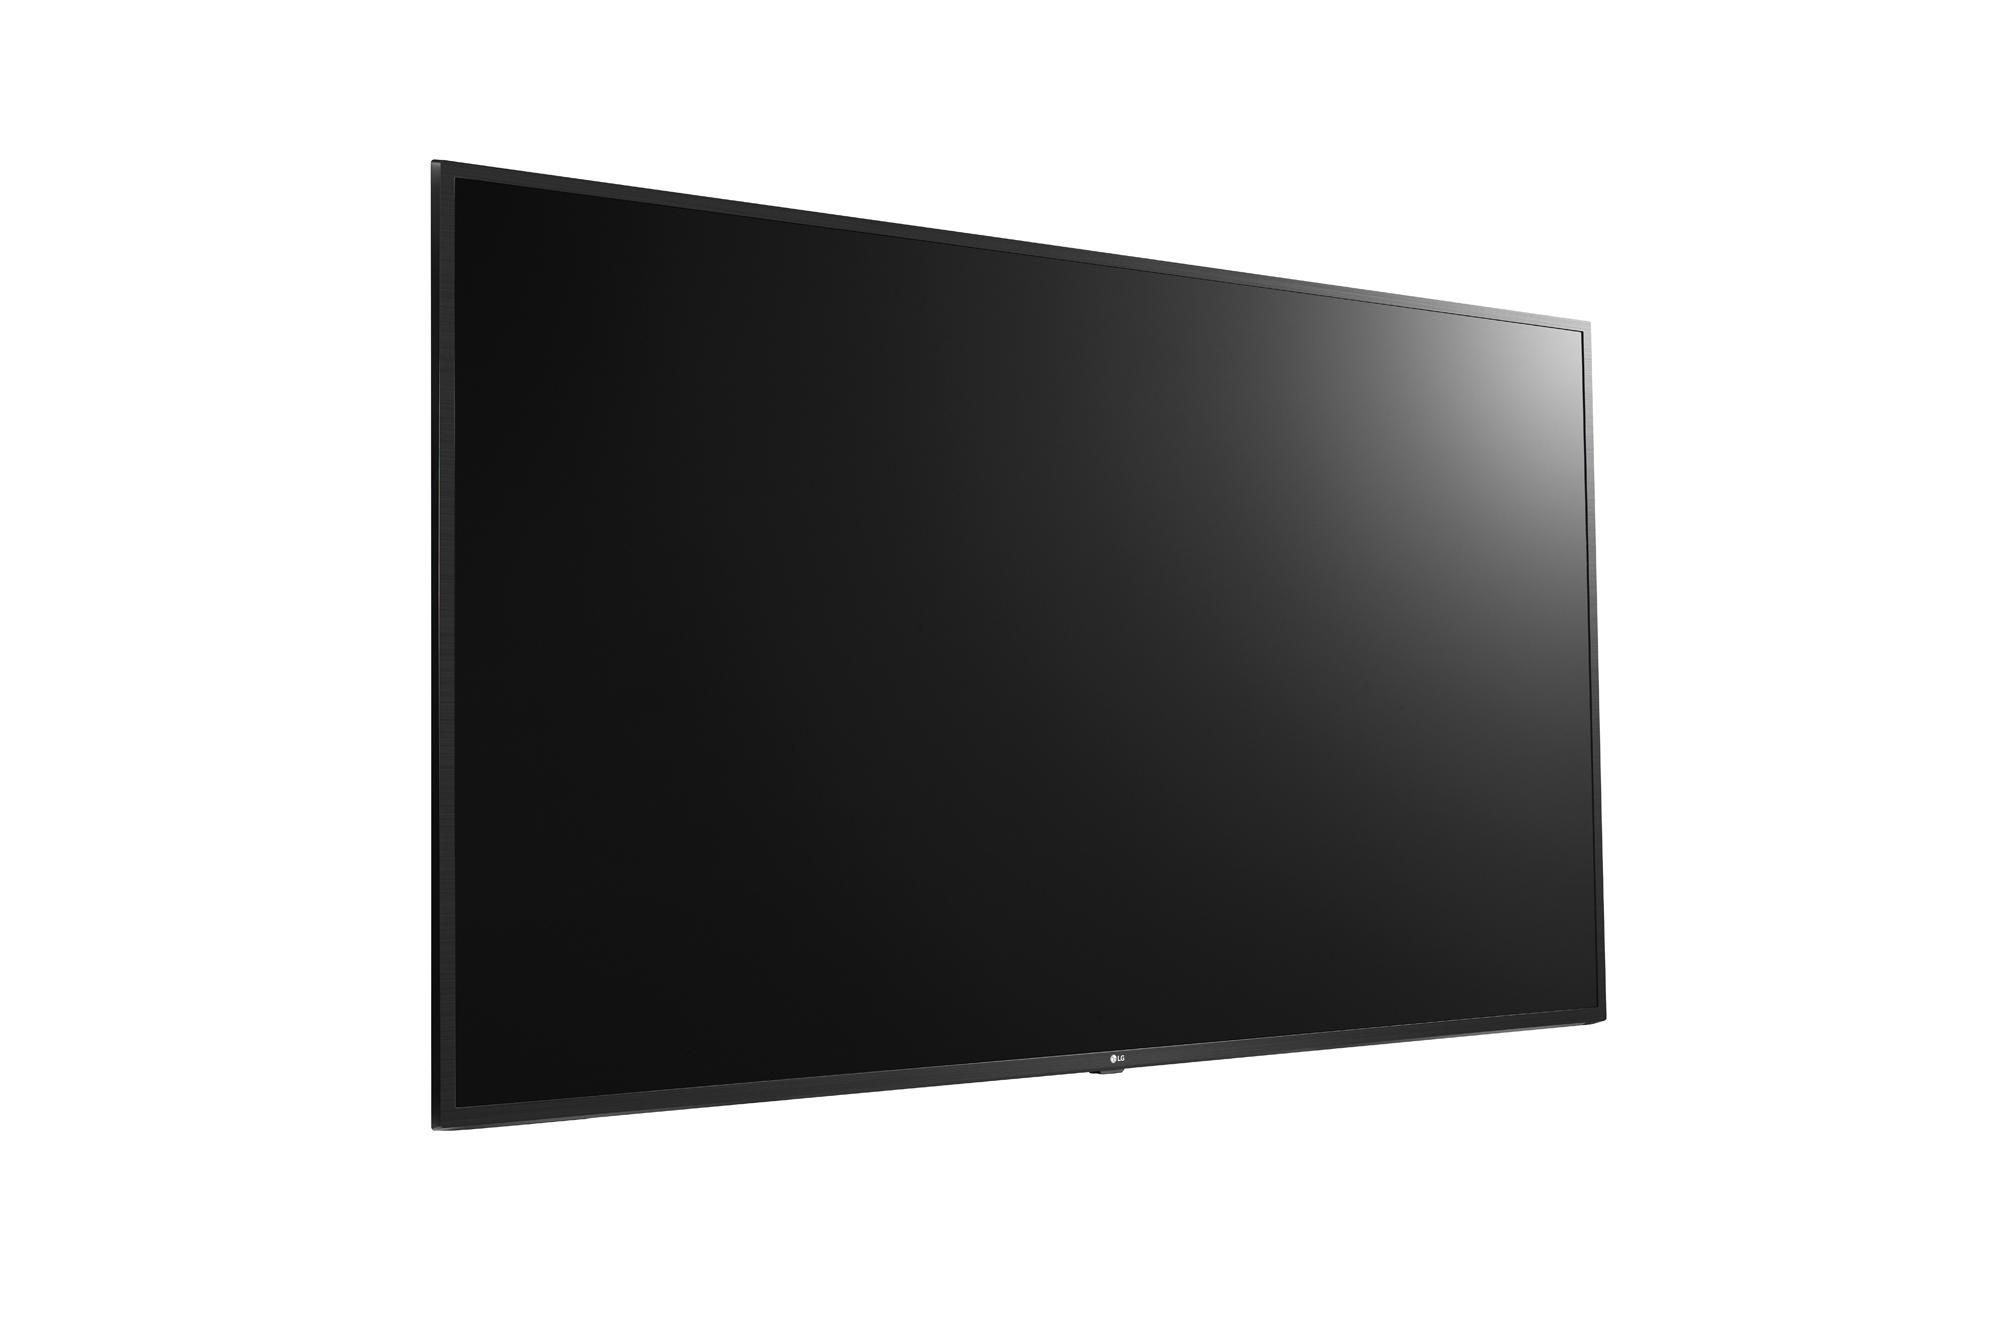 LG Smart TV Signage 70UT640S (CIS) 6